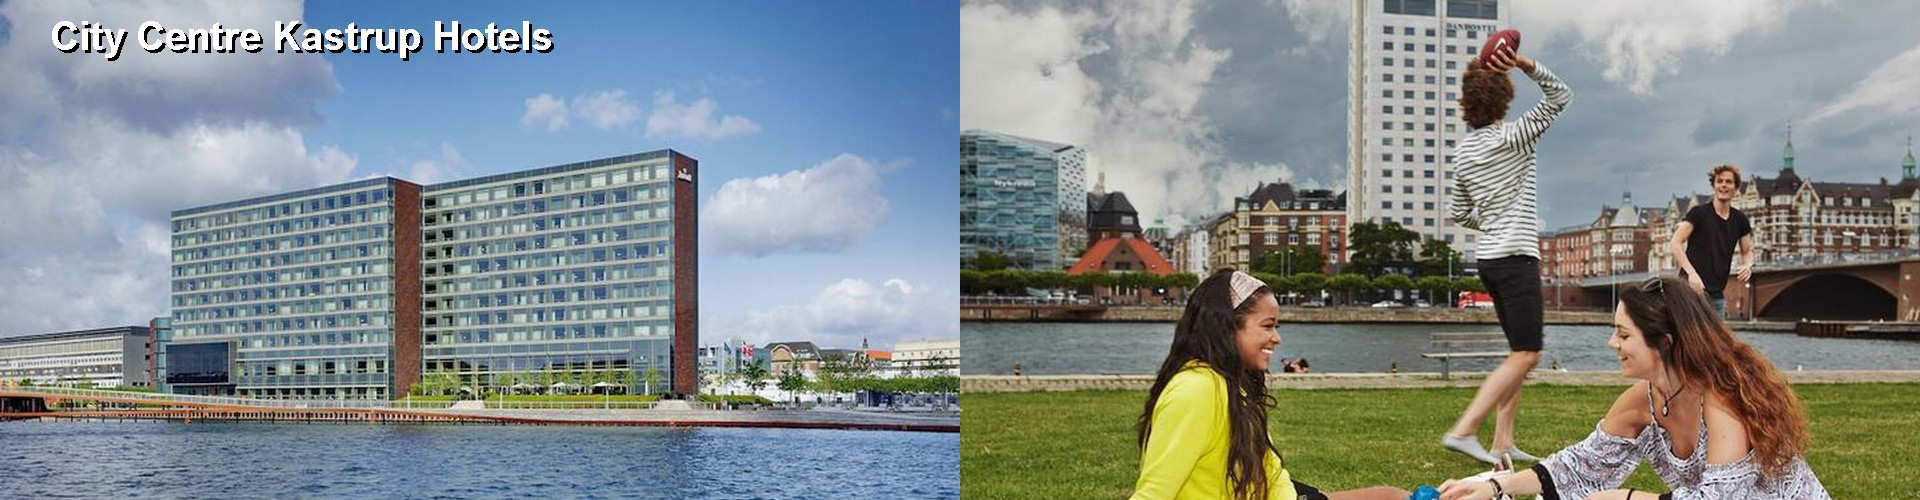 Hotels Near City Centre Kastrup In Copenhagen Airport